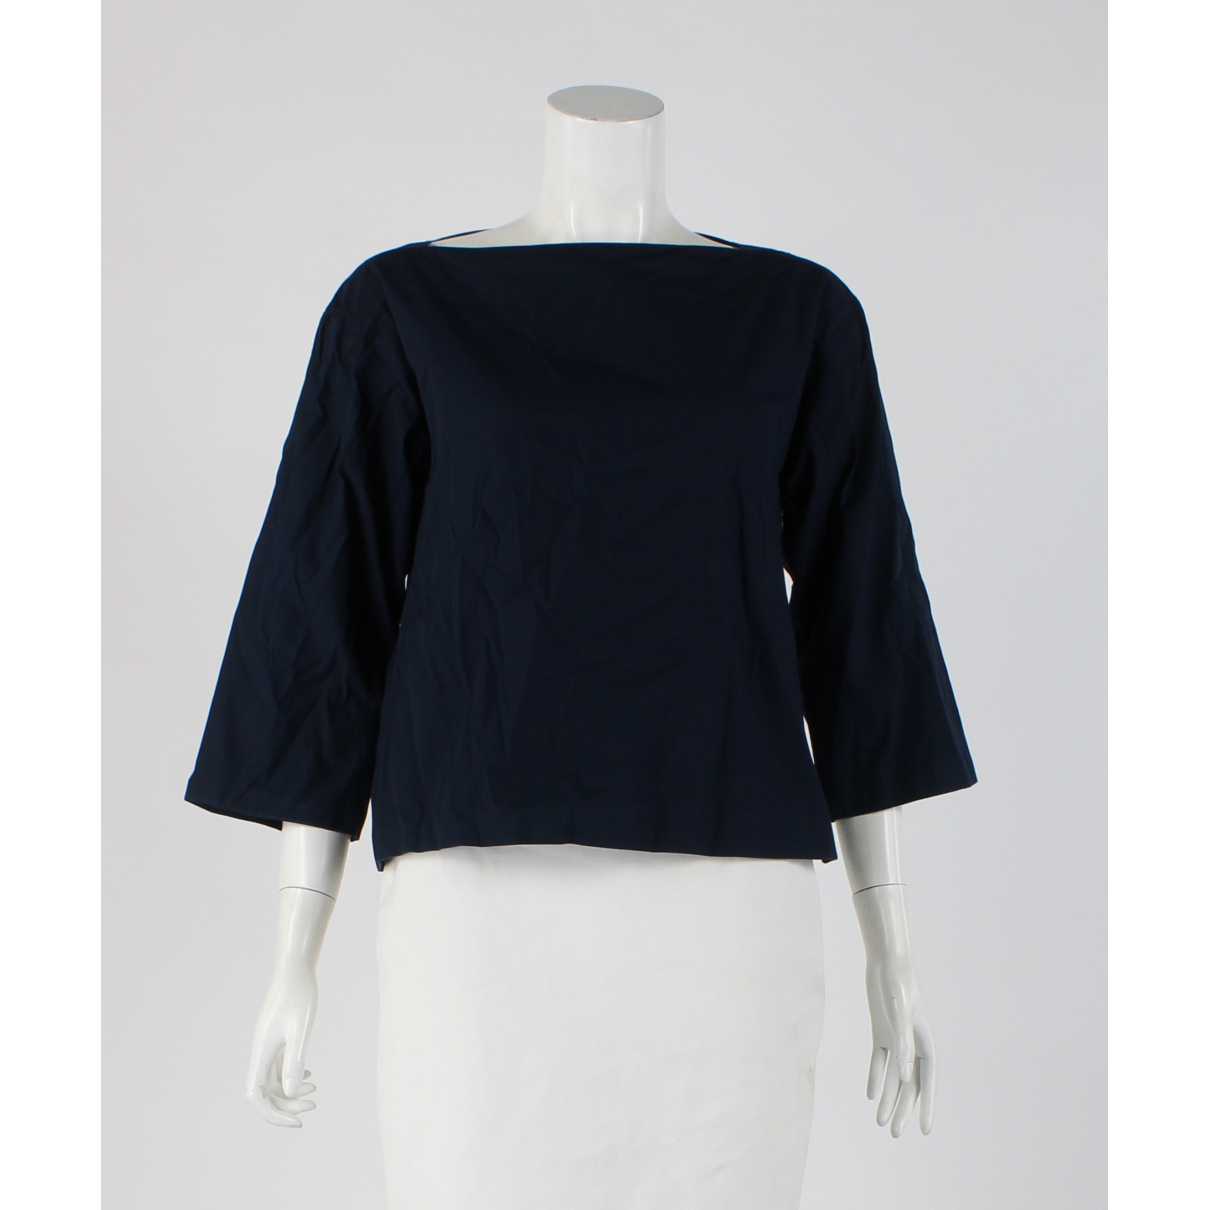 Miu Miu N Navy Cotton jumpsuit for Women 40 FR